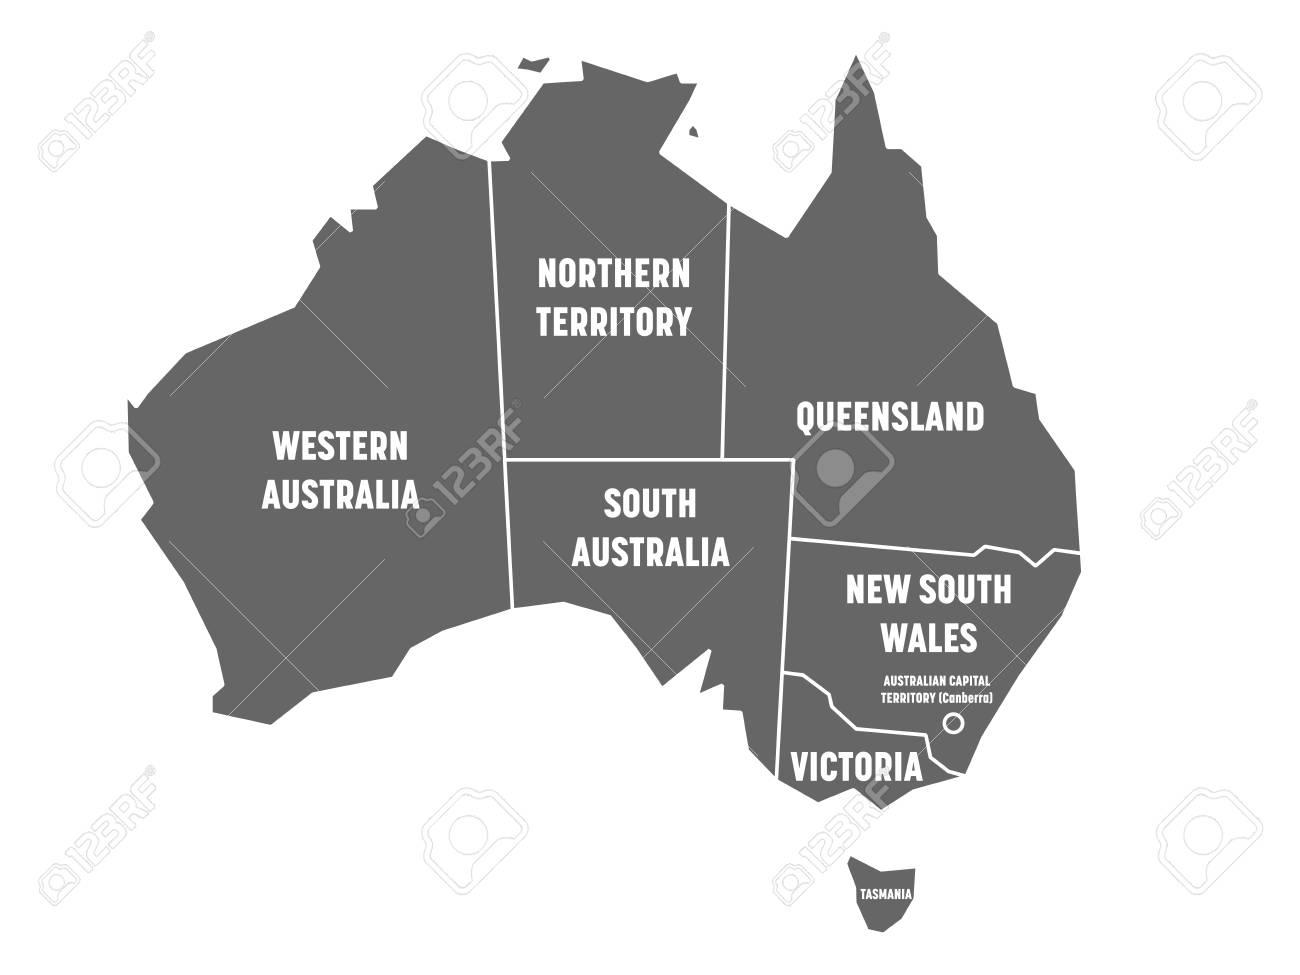 Australia Map States And Territories.Simplified Map Of Australia Divided Into States And Territories